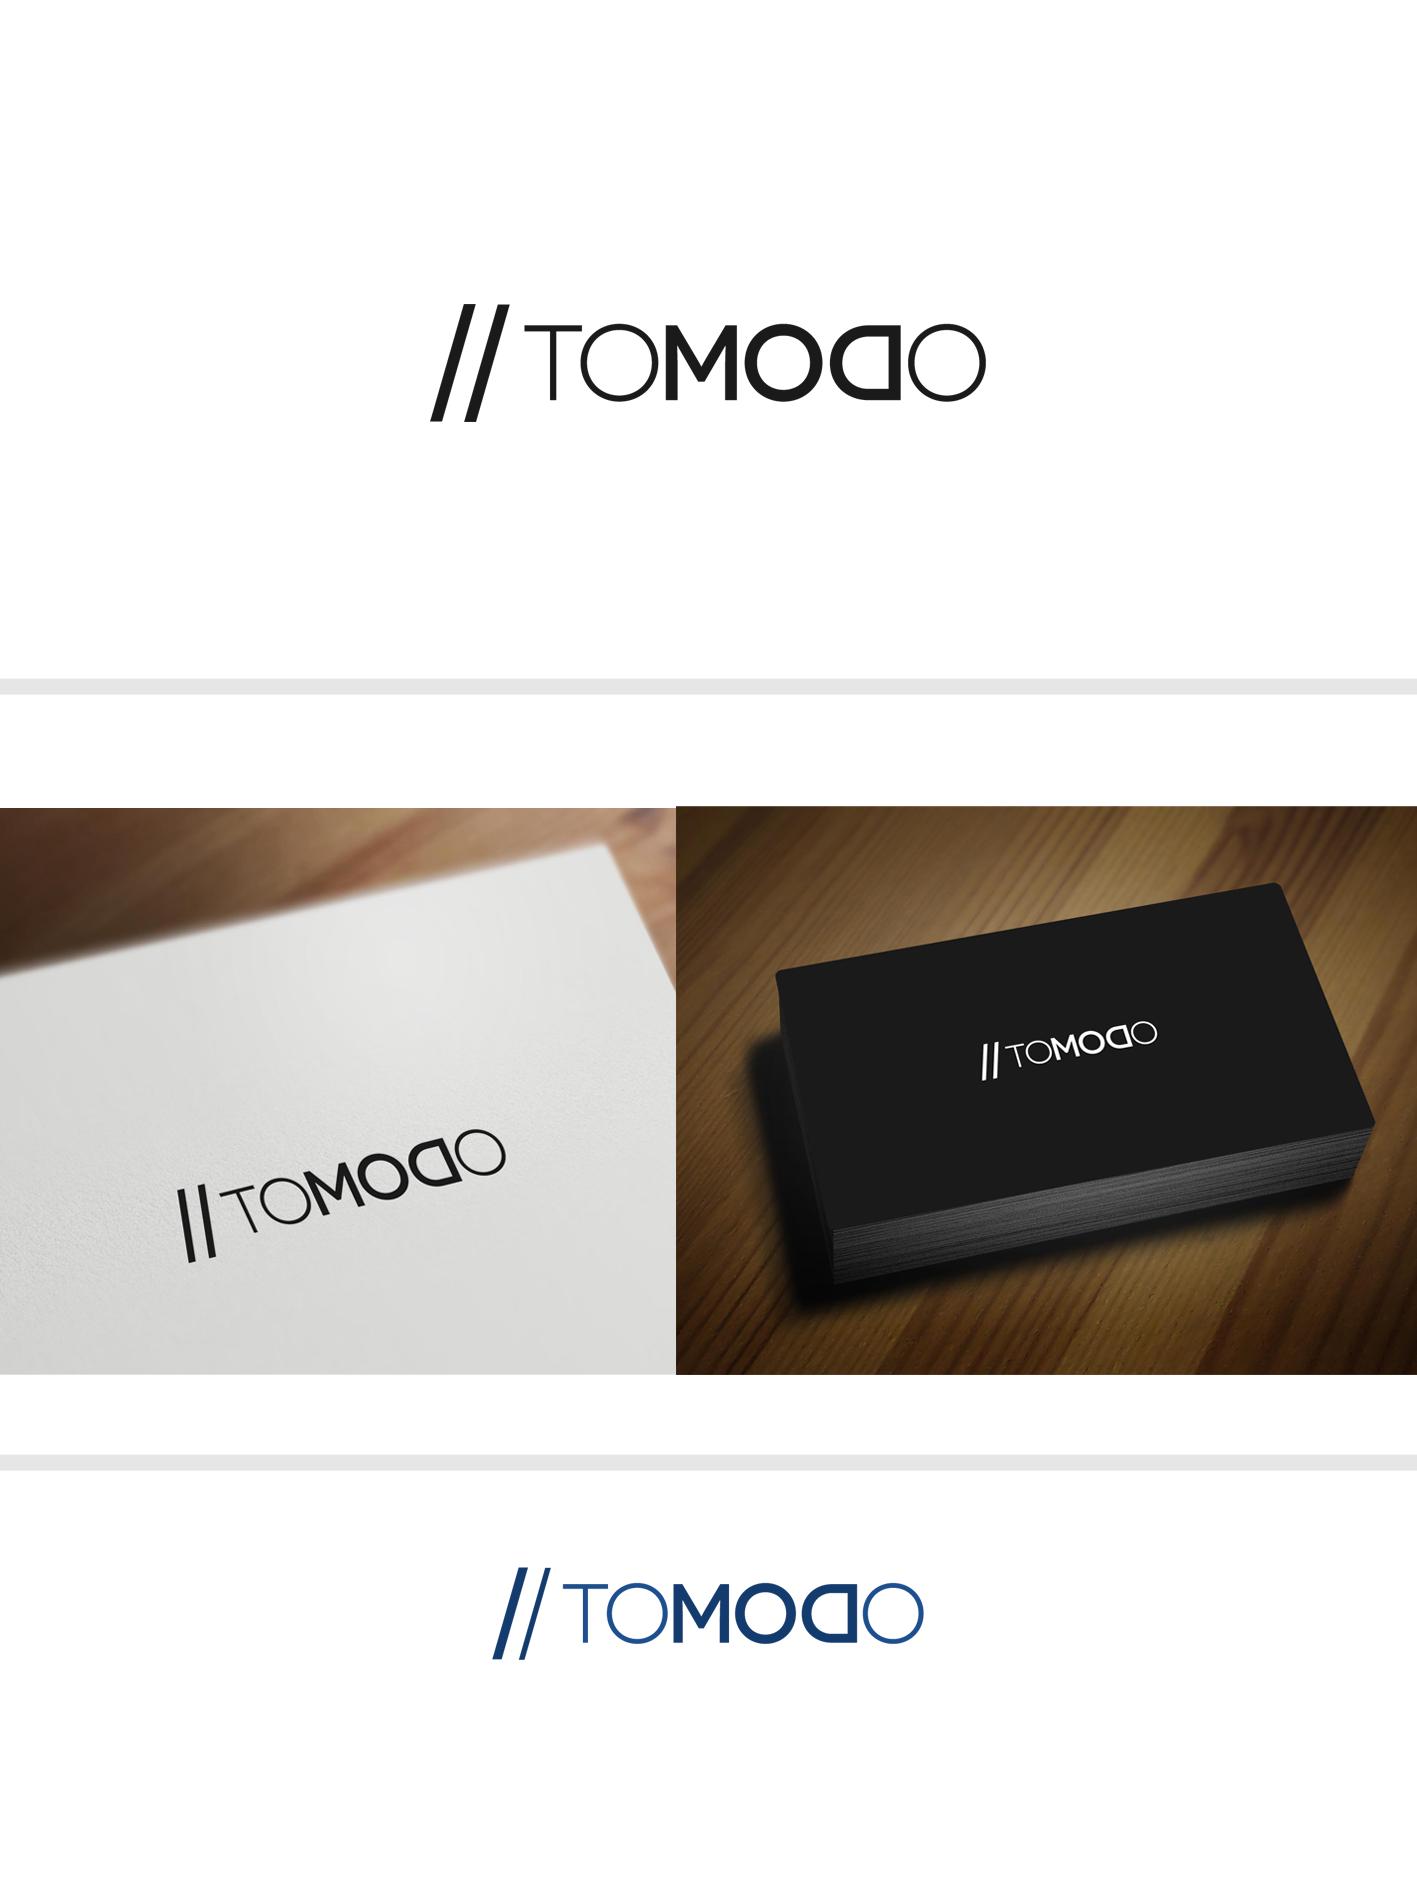 Create the next logo for TOMODO